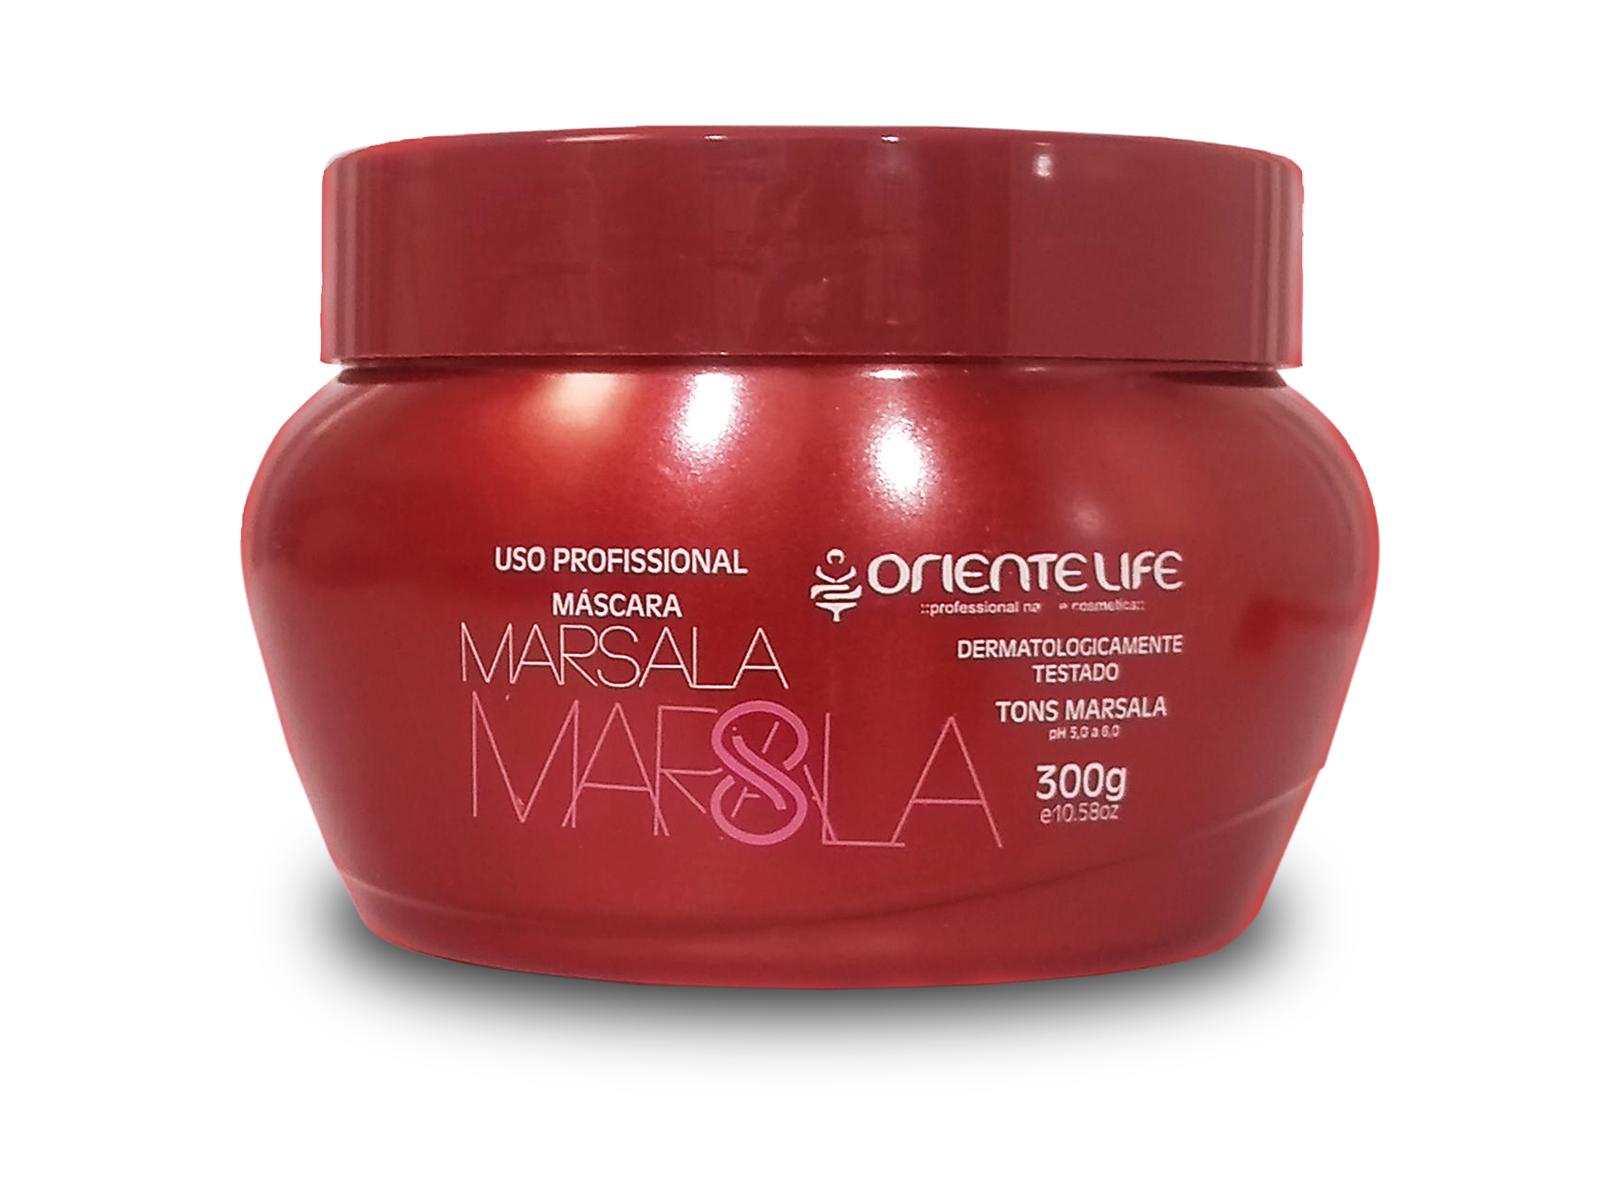 mascara marsala oriente life